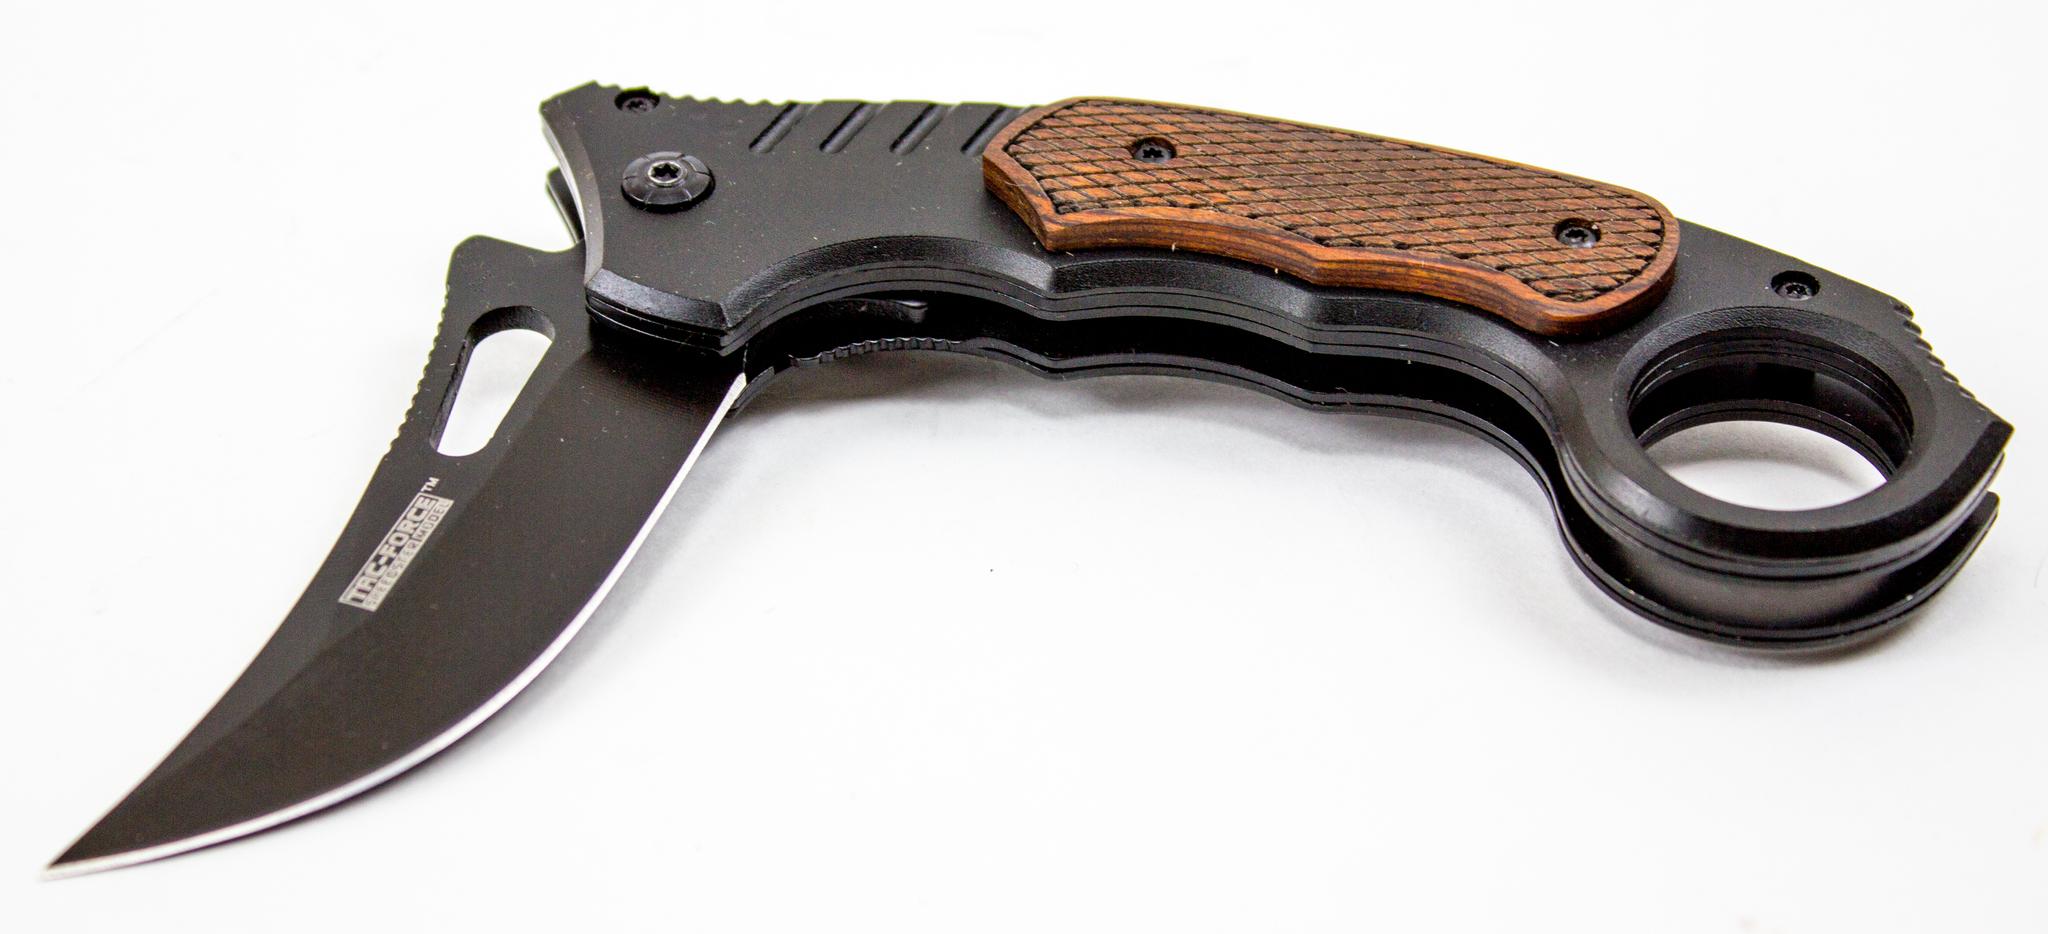 "Нож-керамбит FA25 от Магазин ножей ""Ножиков"""